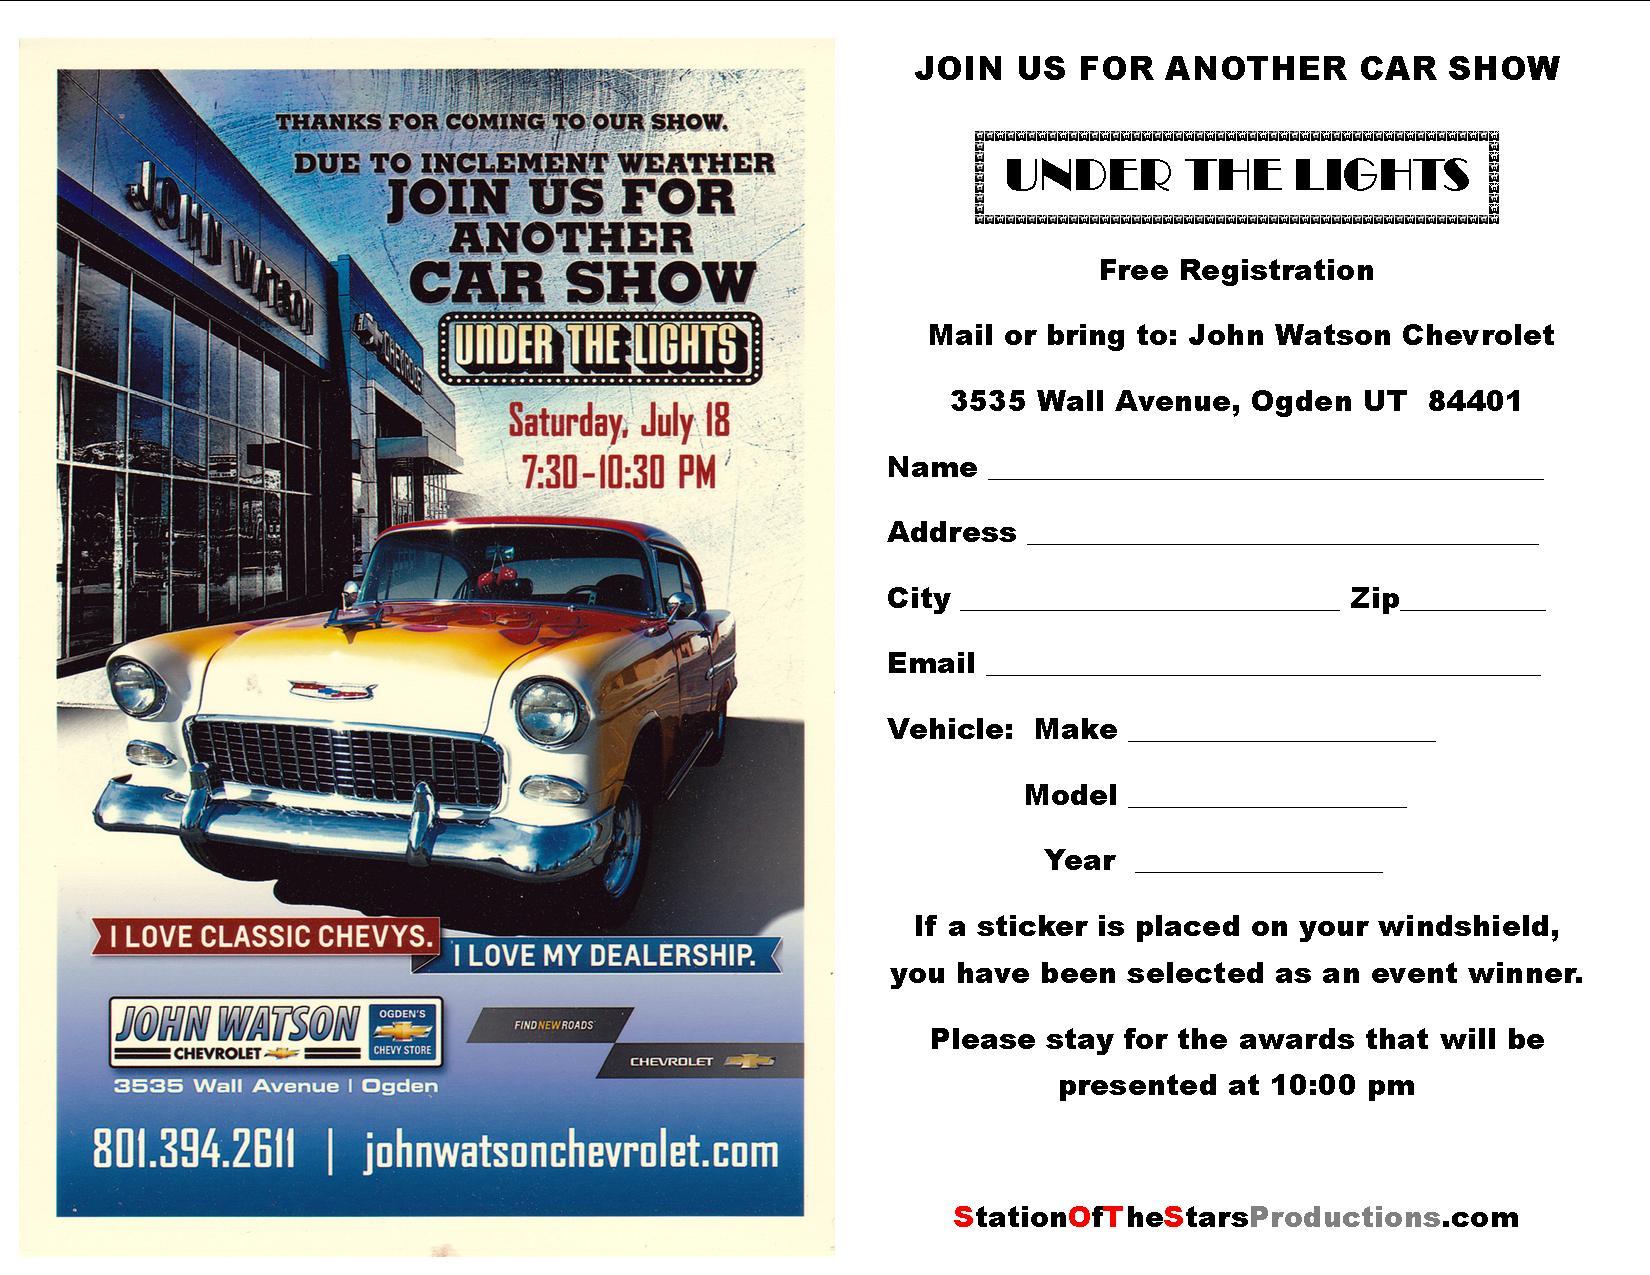 2015 john watson chevrolet under the lights car show john watson chevrole. Cars Review. Best American Auto & Cars Review